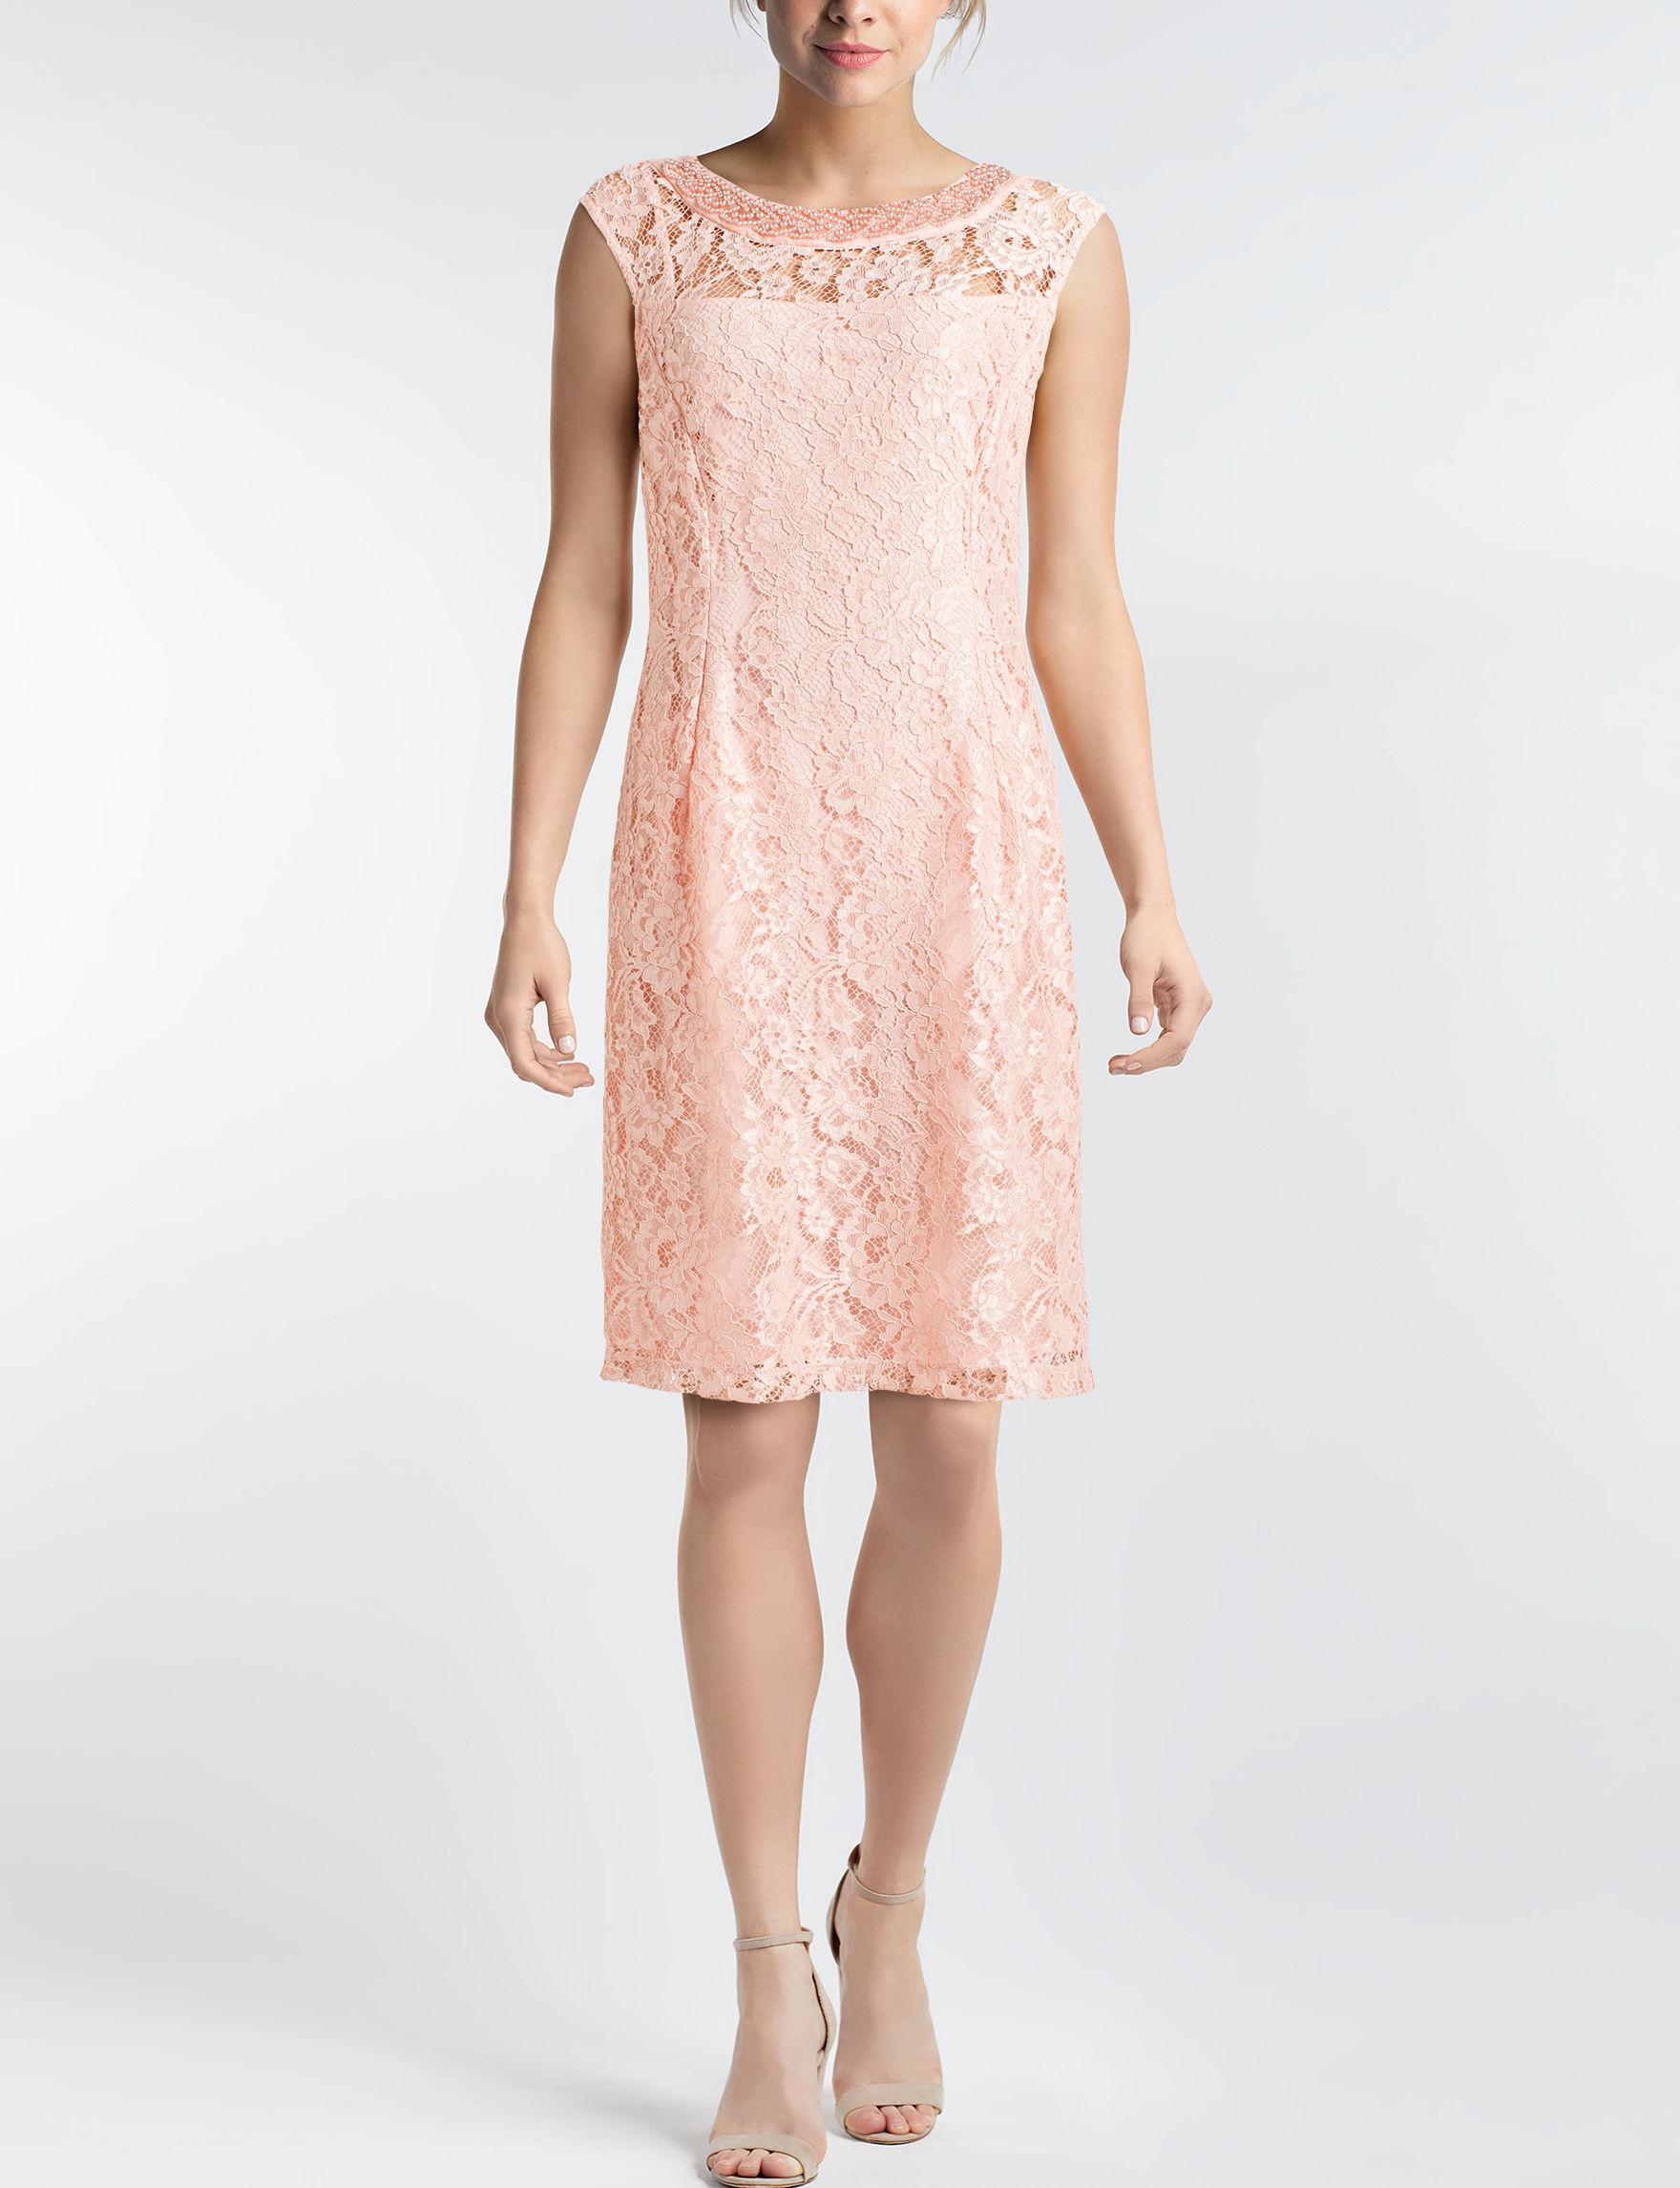 Sandra Darren Coral Cocktail & Party Evening & Formal A-line Dresses Fit & Flare Dresses